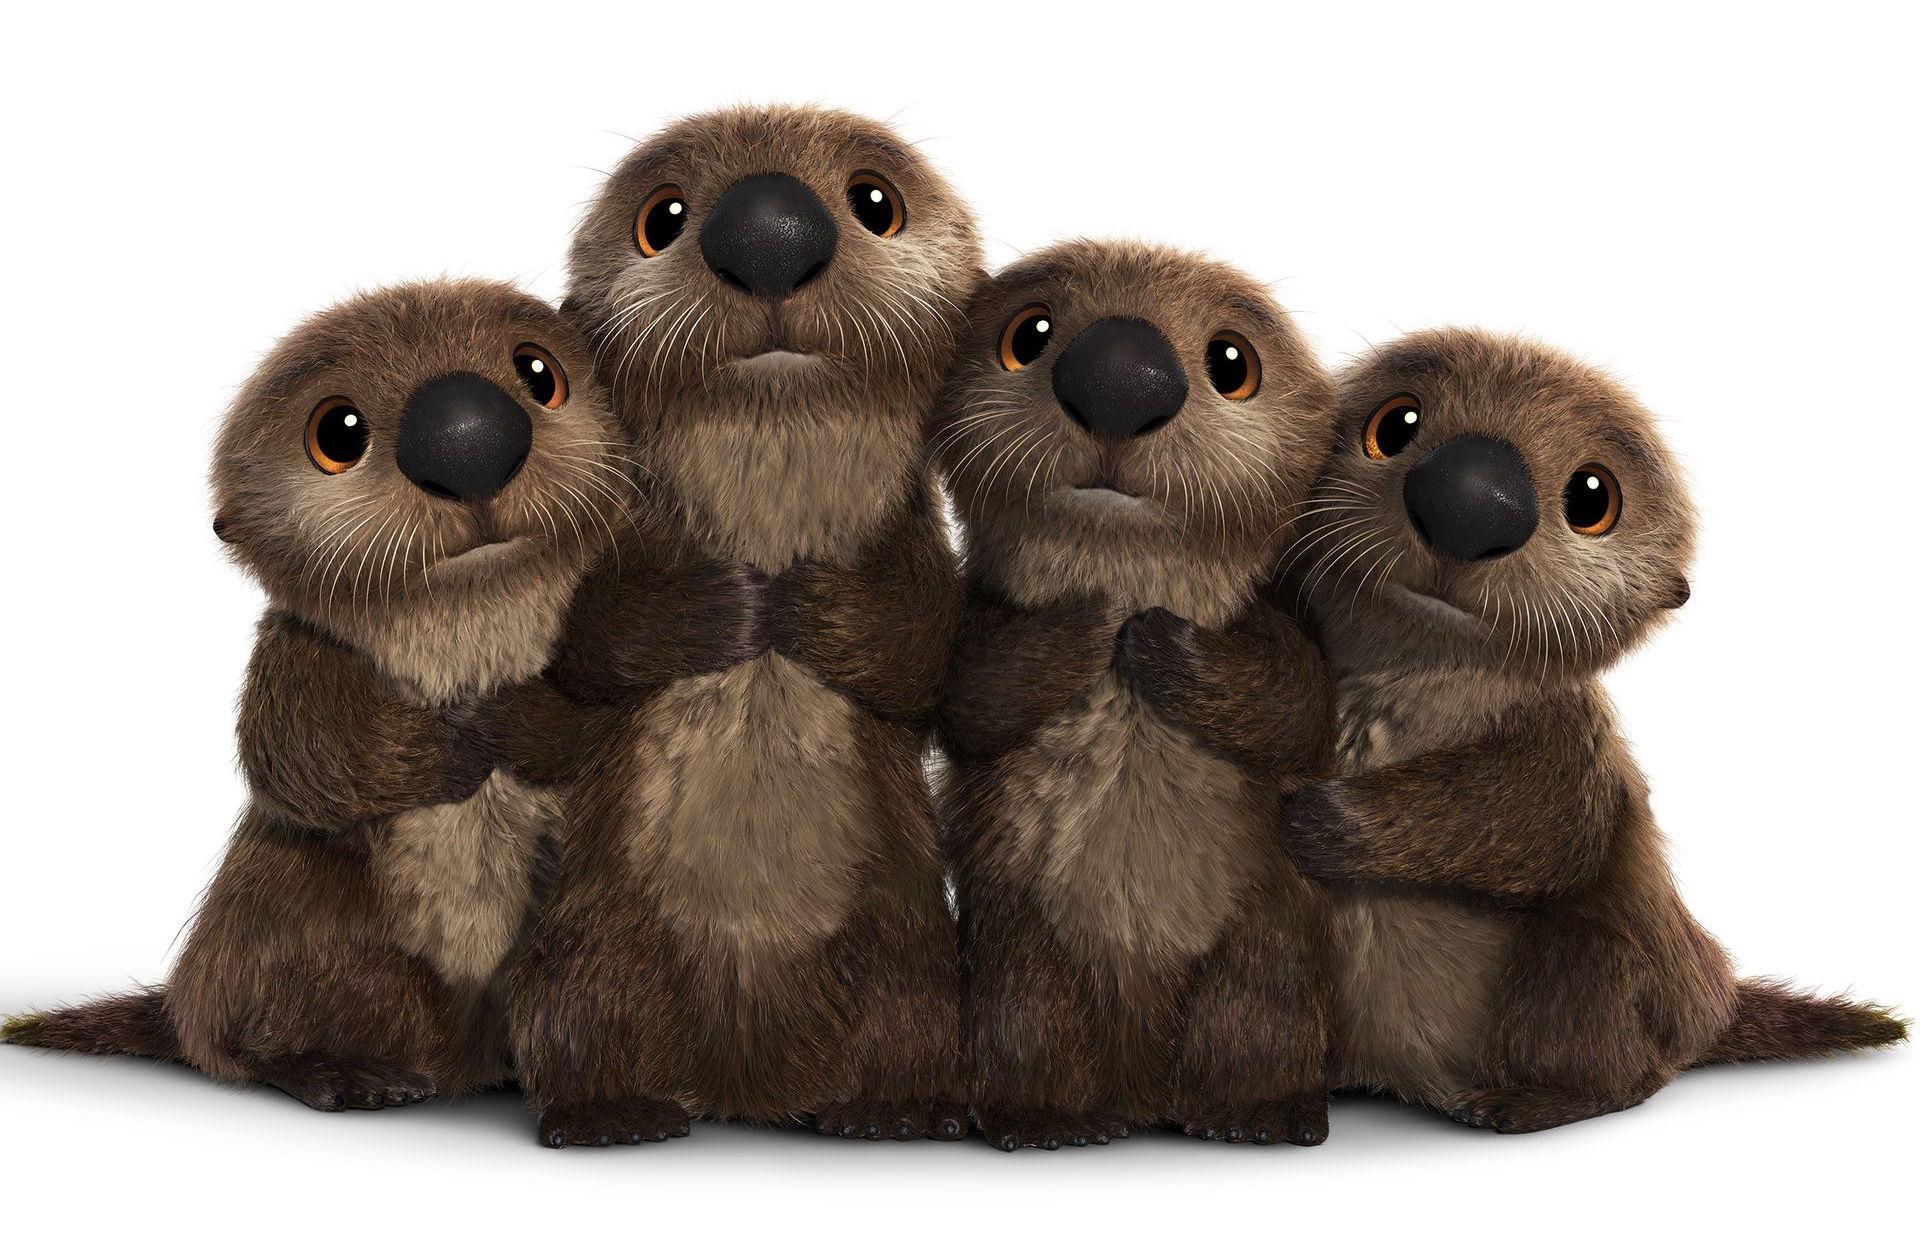 Finding-Dory-Sea-Otters_Pixar-Post.jpg